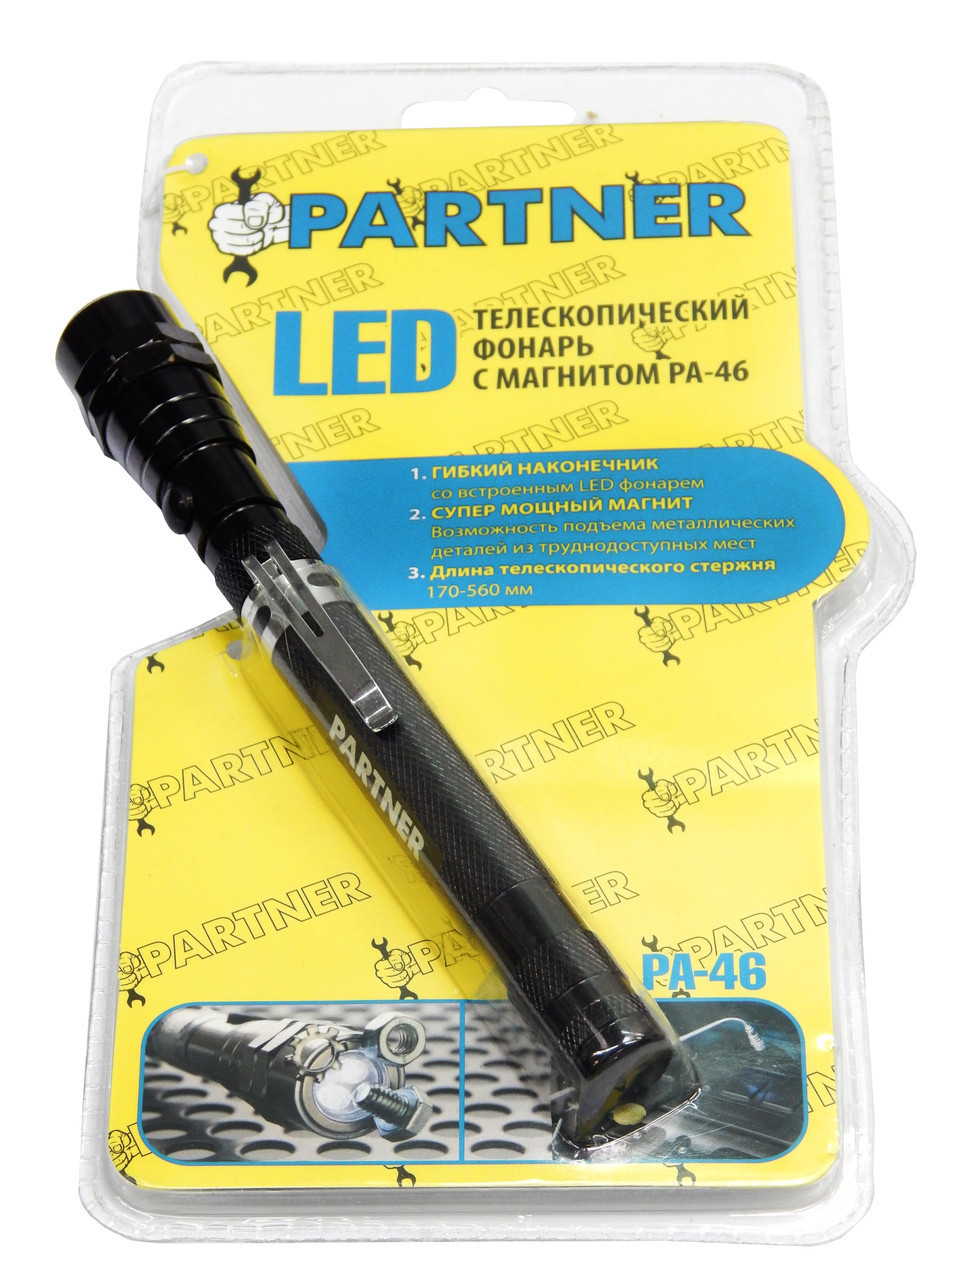 LED Телескопический фонарь с магнитом (3 светодиода)